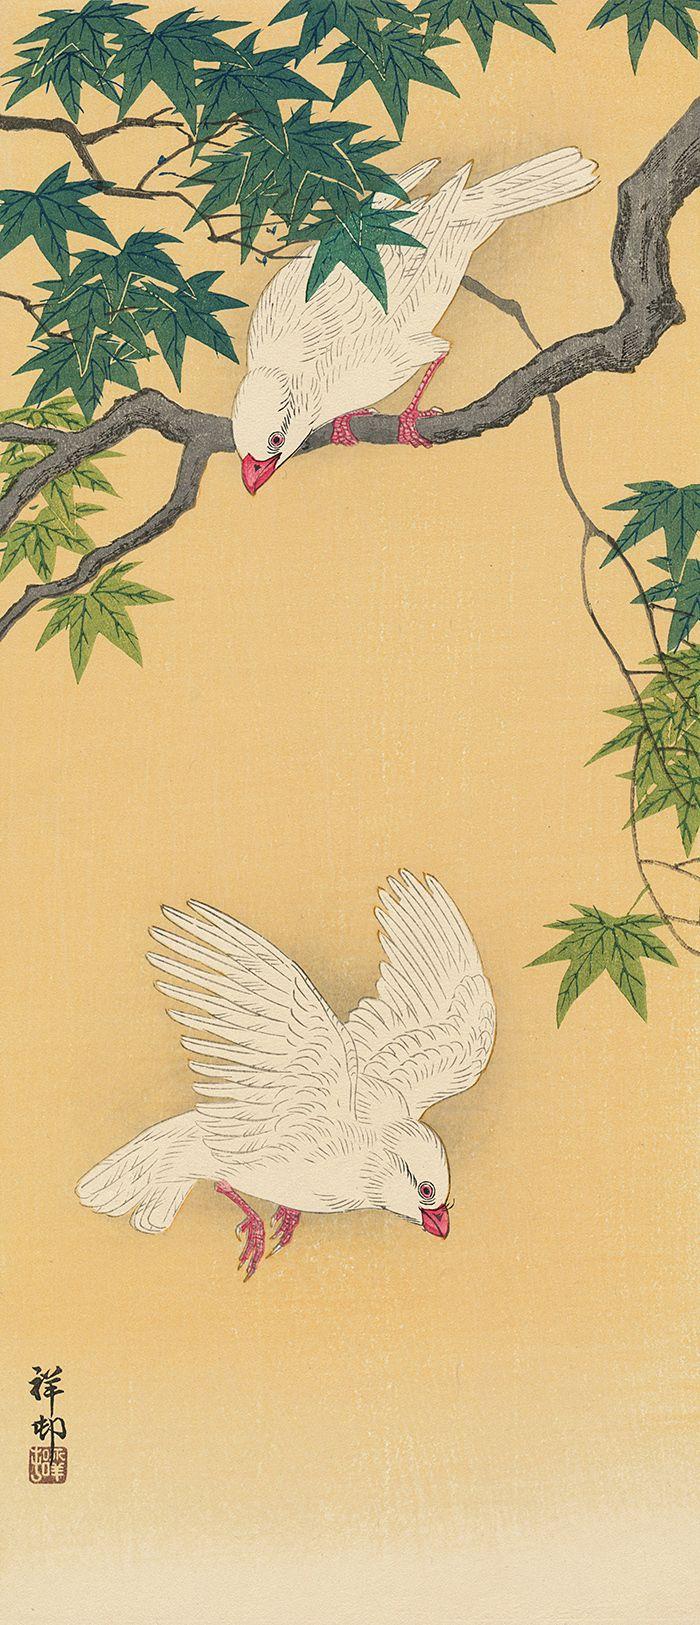 Green Birds Maple Tree Asian Japanese Ohara Shoson Counted Cross Stitch Pattern